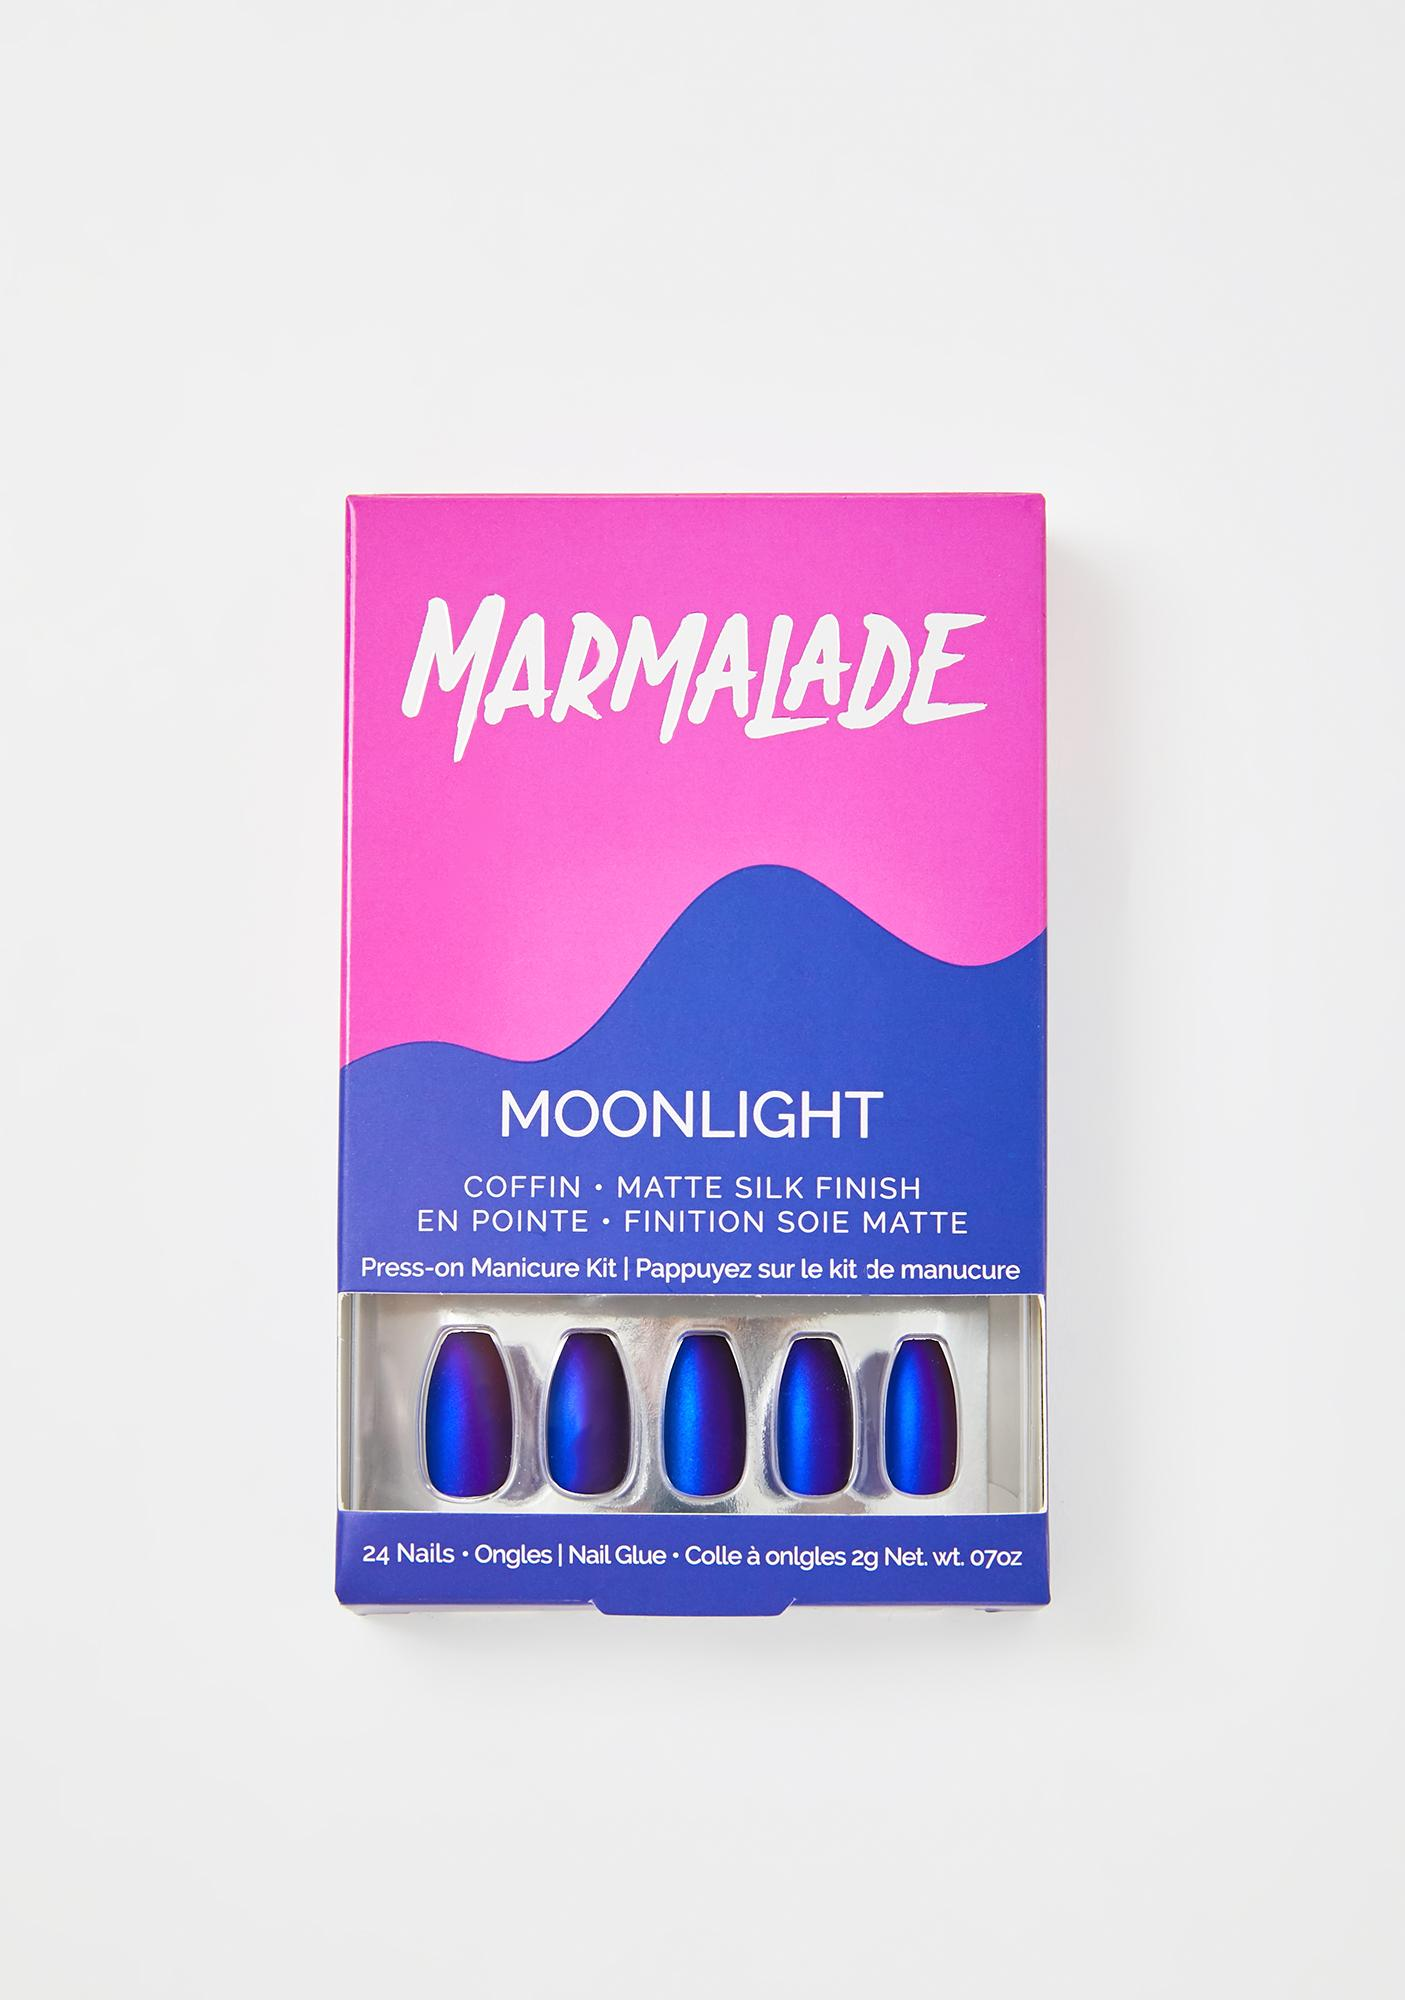 Marmalade Moonlight Press On Nails